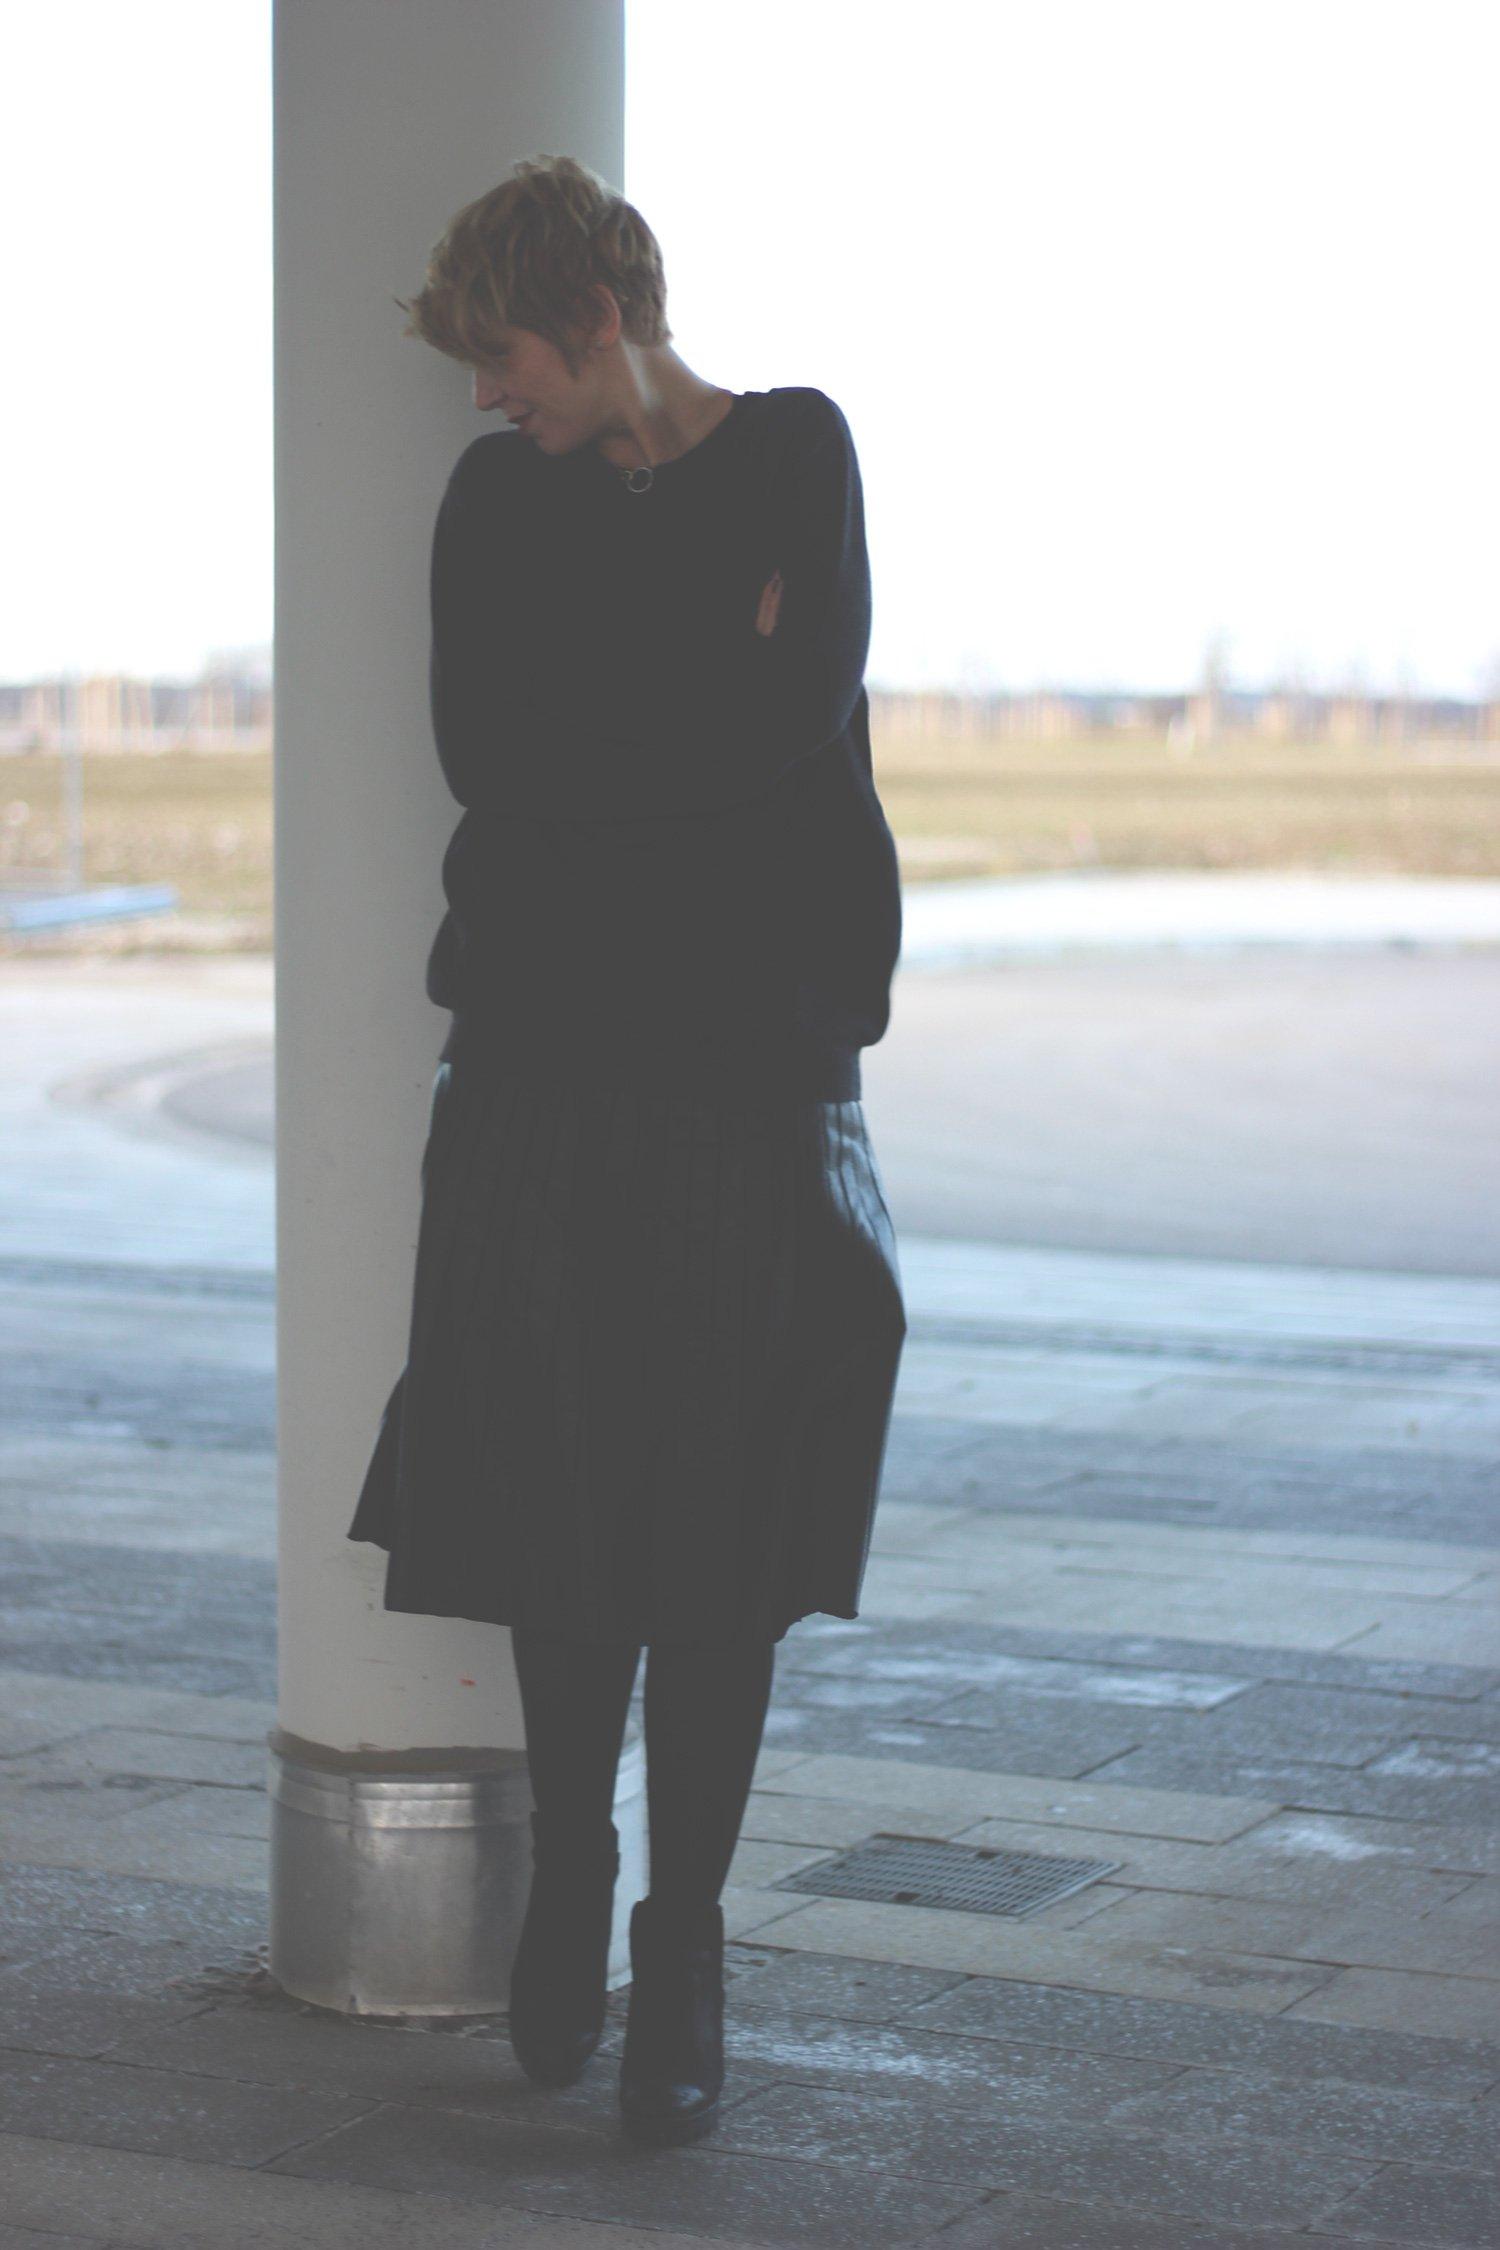 Fake leather, faltenrock, pleated skirt, schwarz, black, Tipp, Netzstrumpfhosen, Cashmere, Pullover, Boyfriendpullover